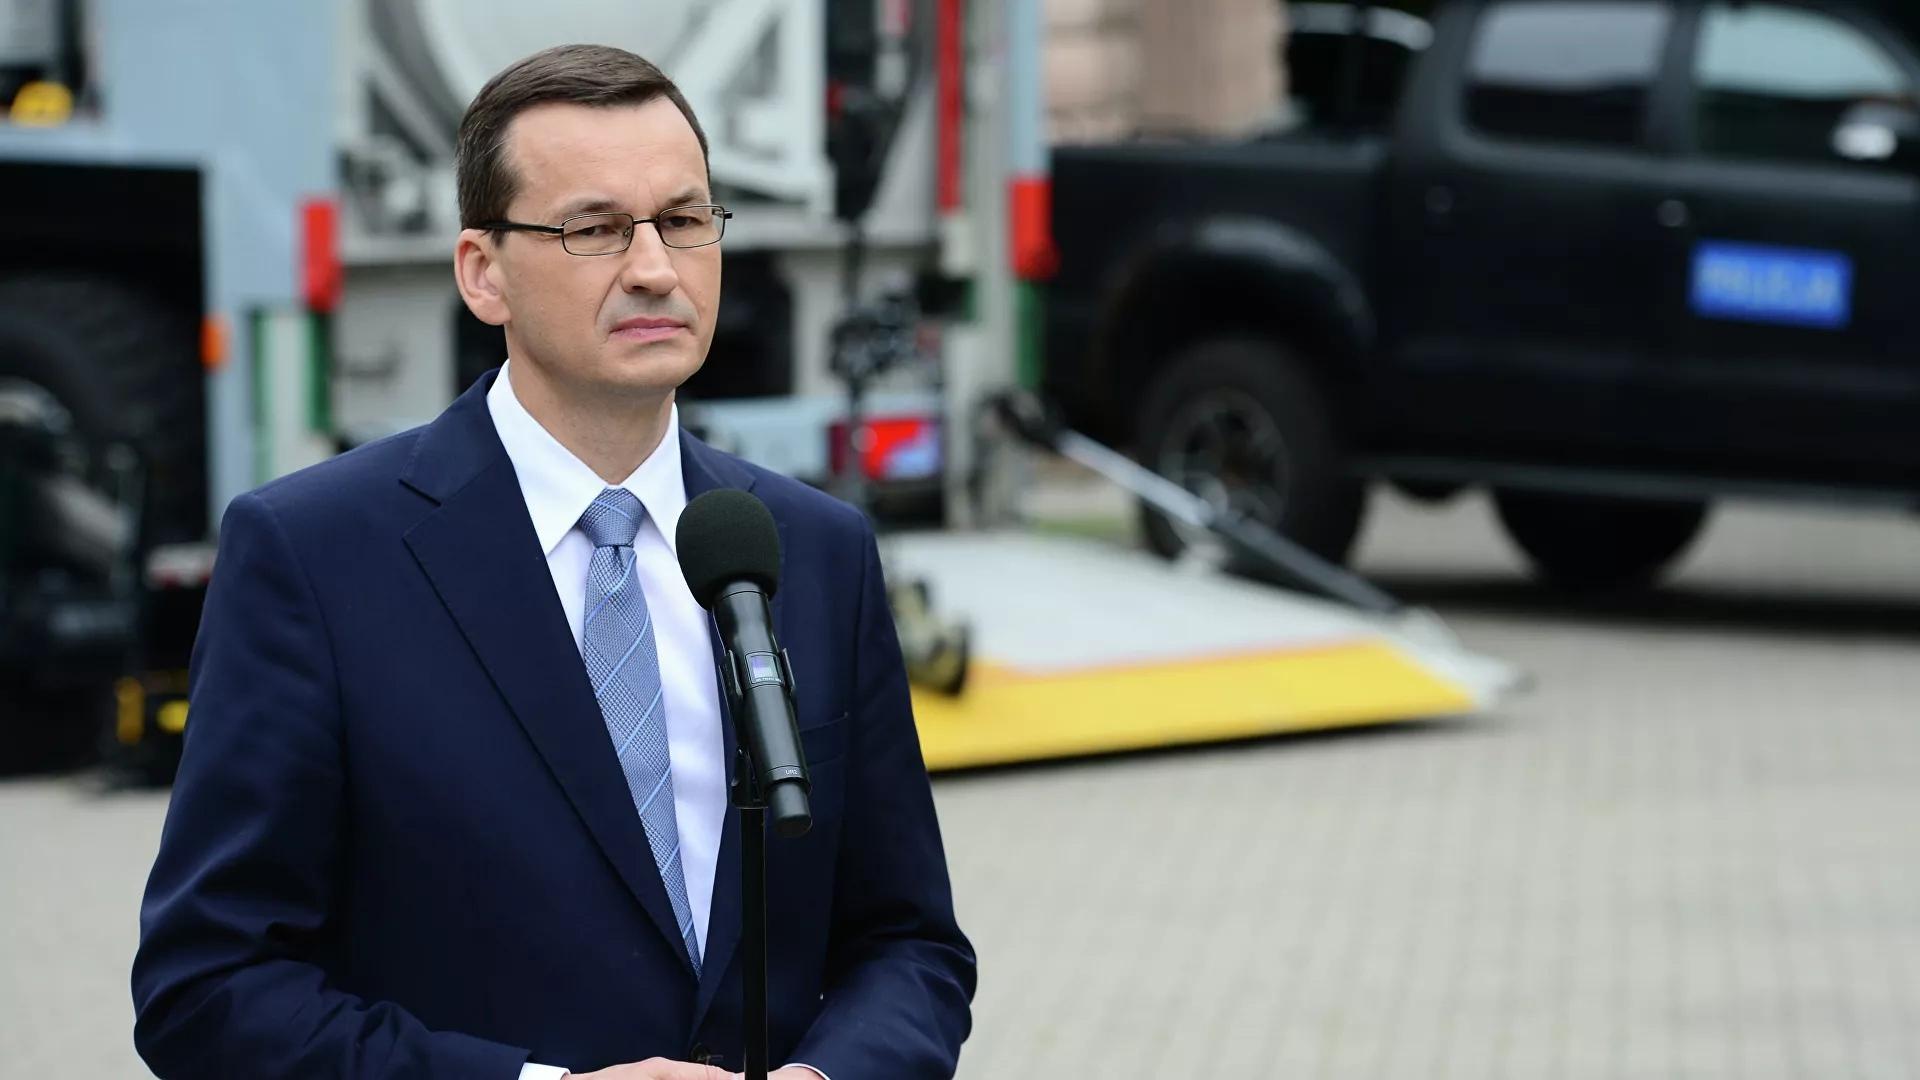 Polish PM says Russia may hinder Chinese expansion